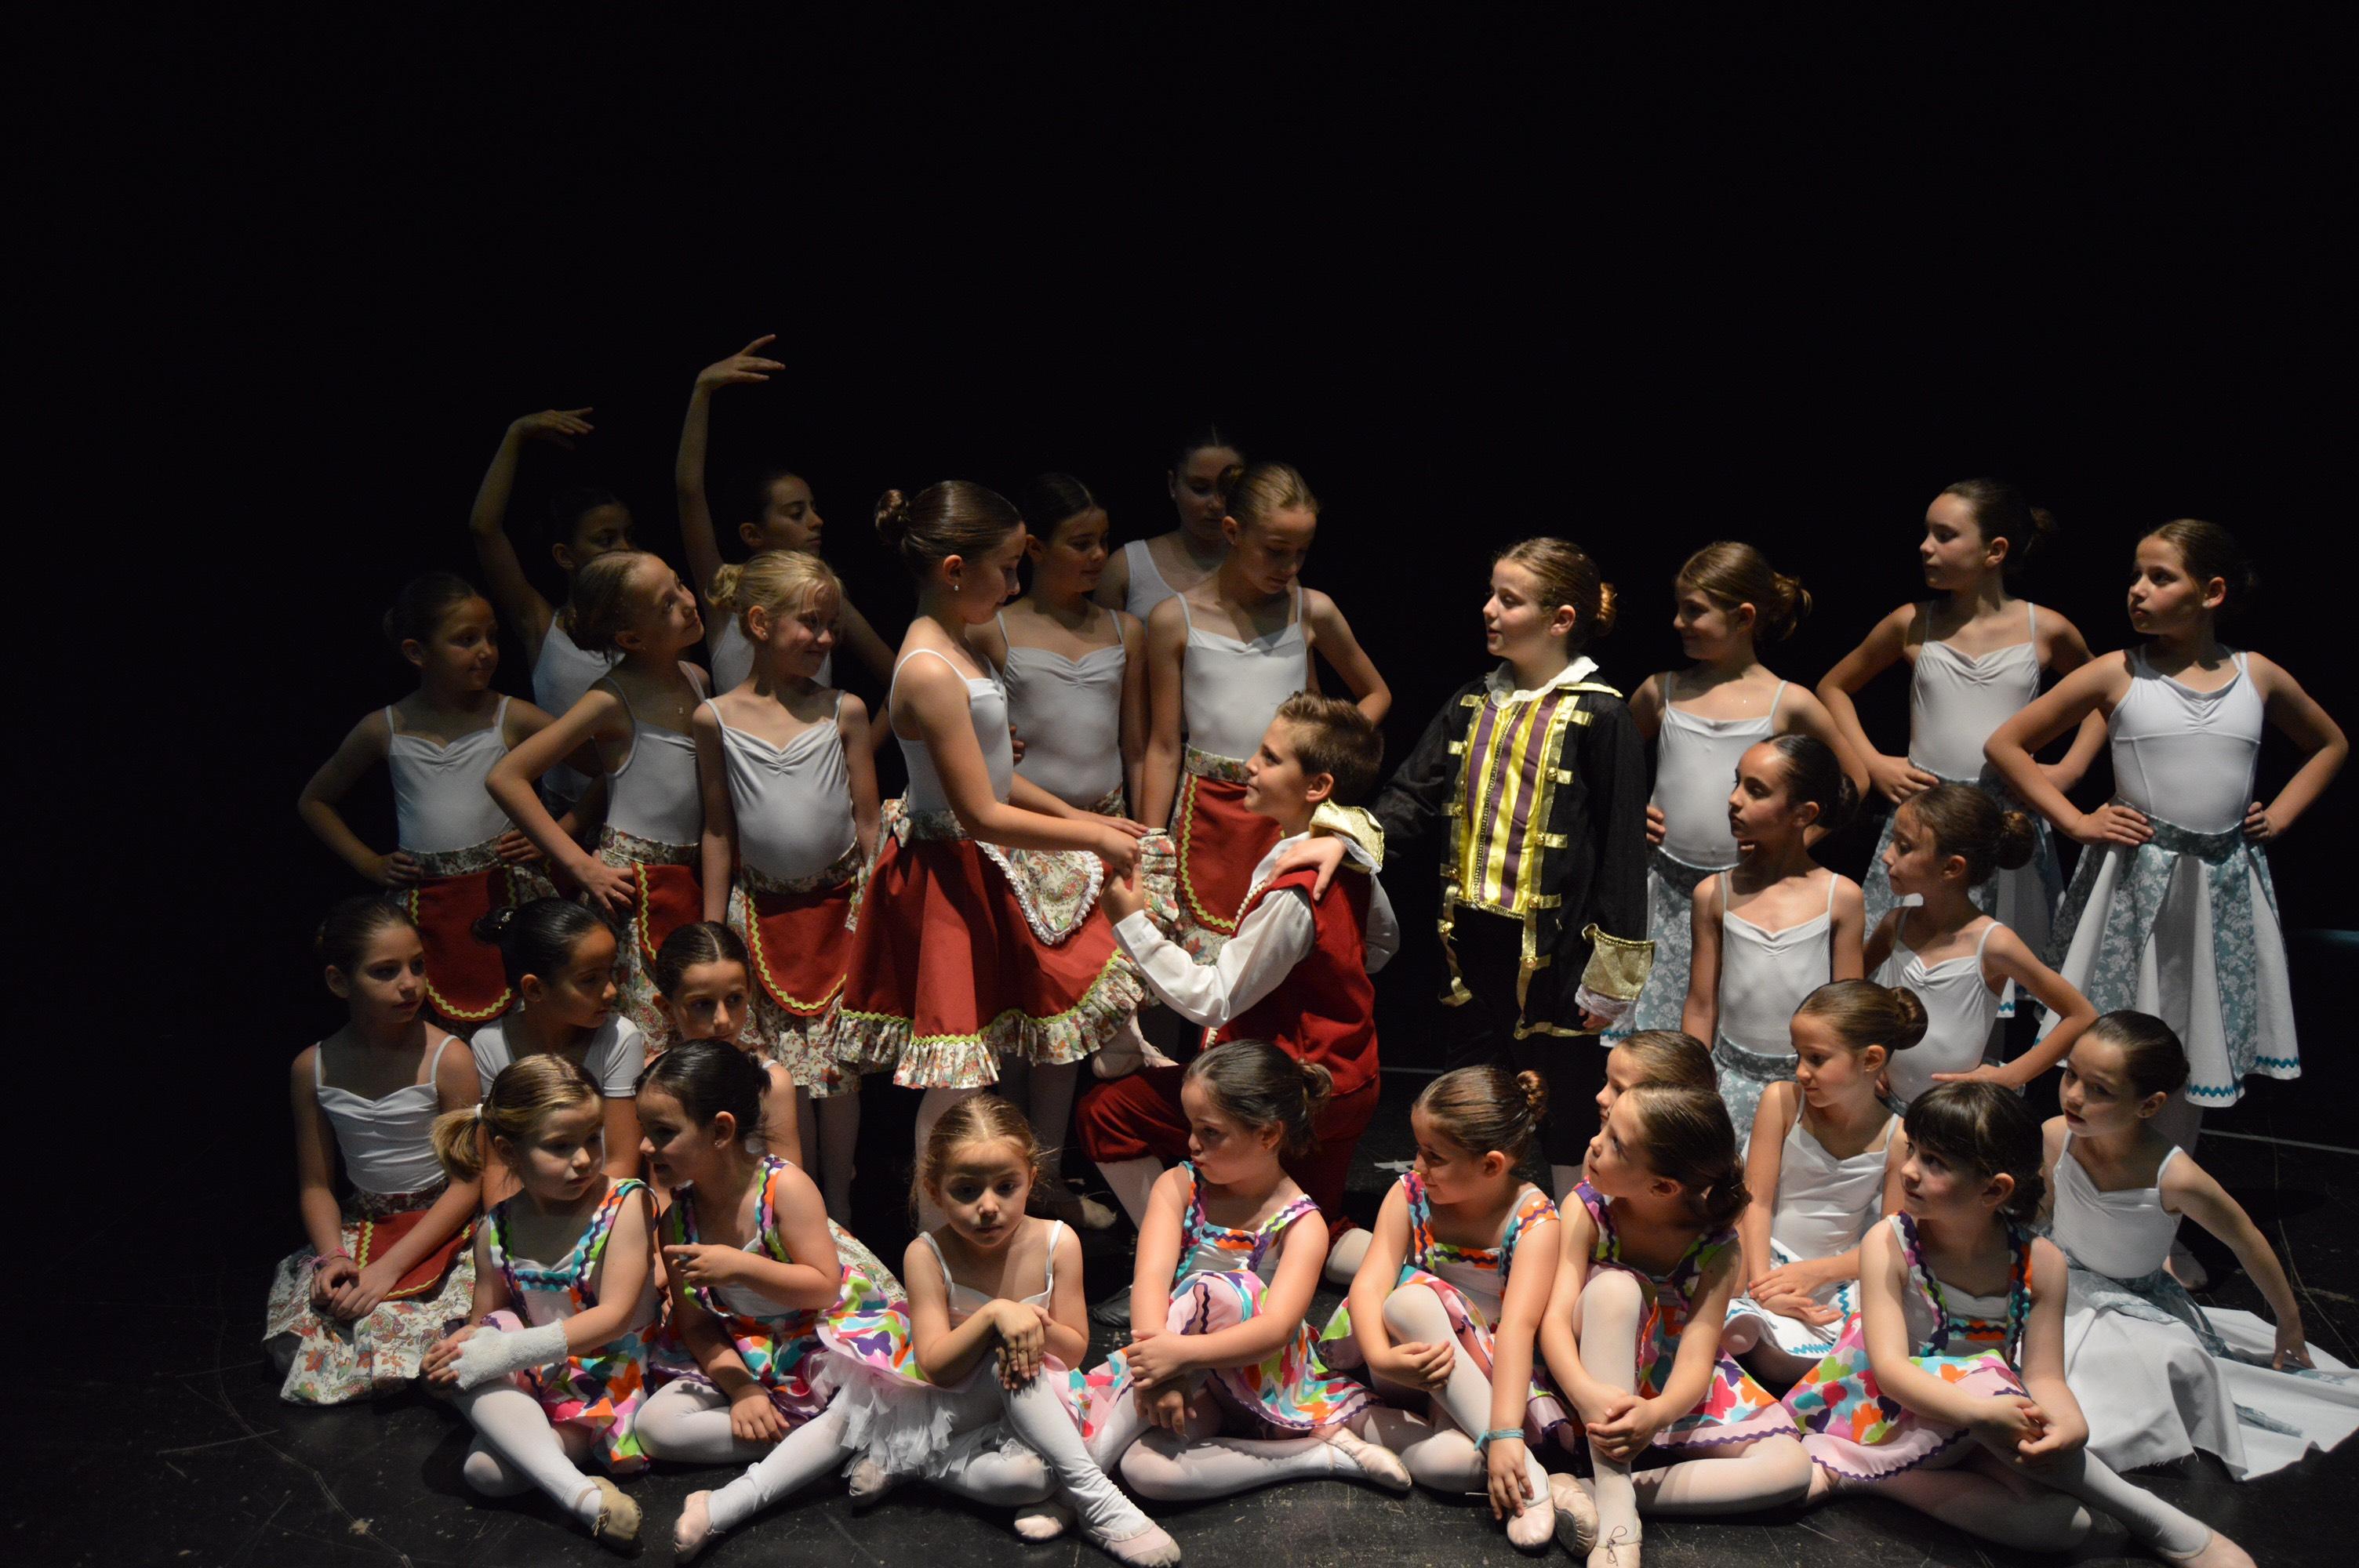 Ballet, teatro o  'patchwork', entre los talleres culturales de Cúllar Vega